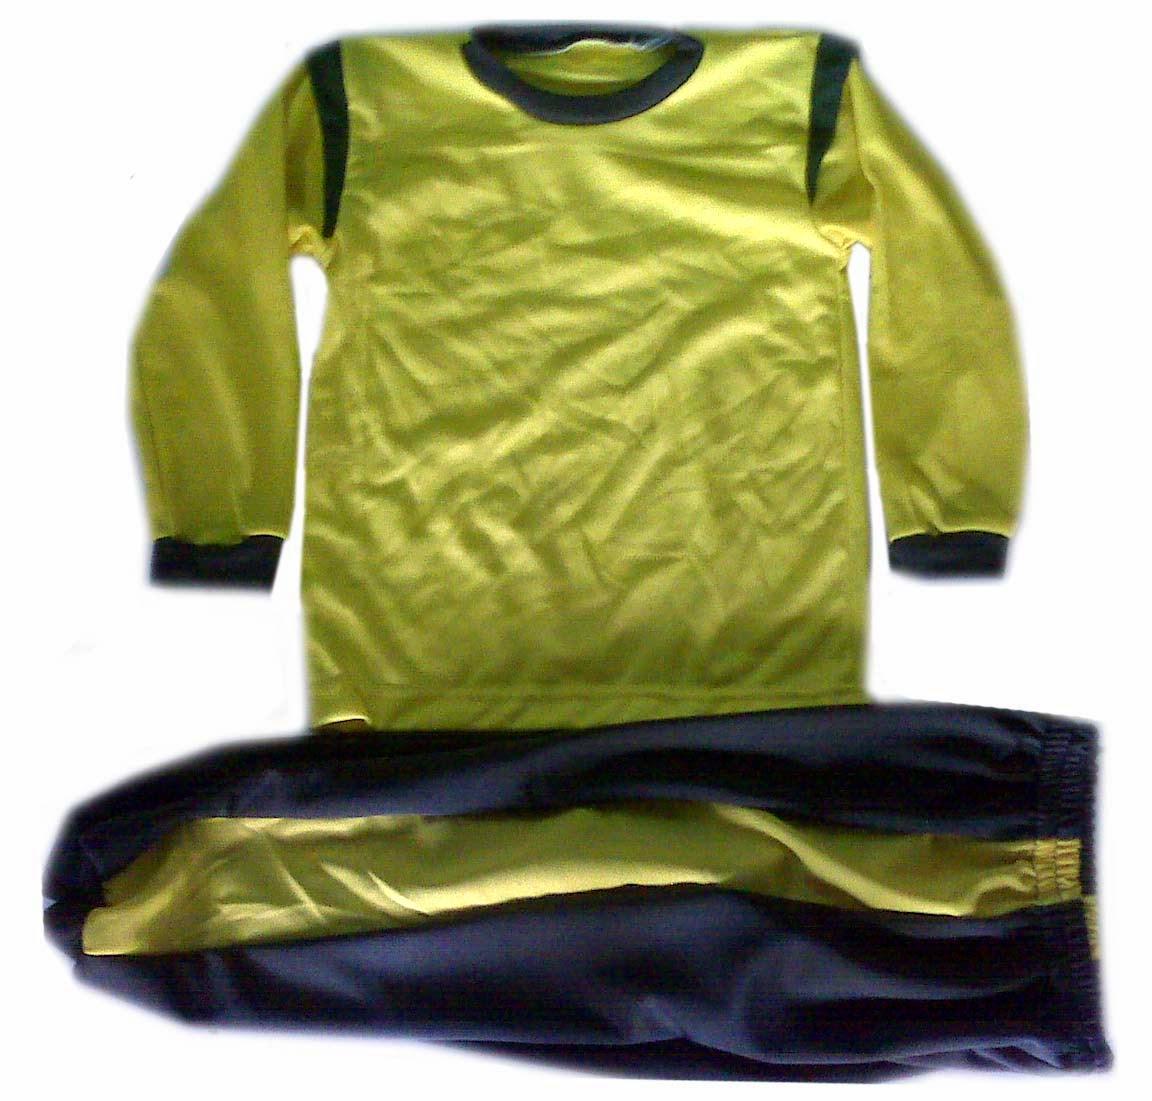 Konveksi & Grosir Kaos Olahraga Ready Stock TK Murah